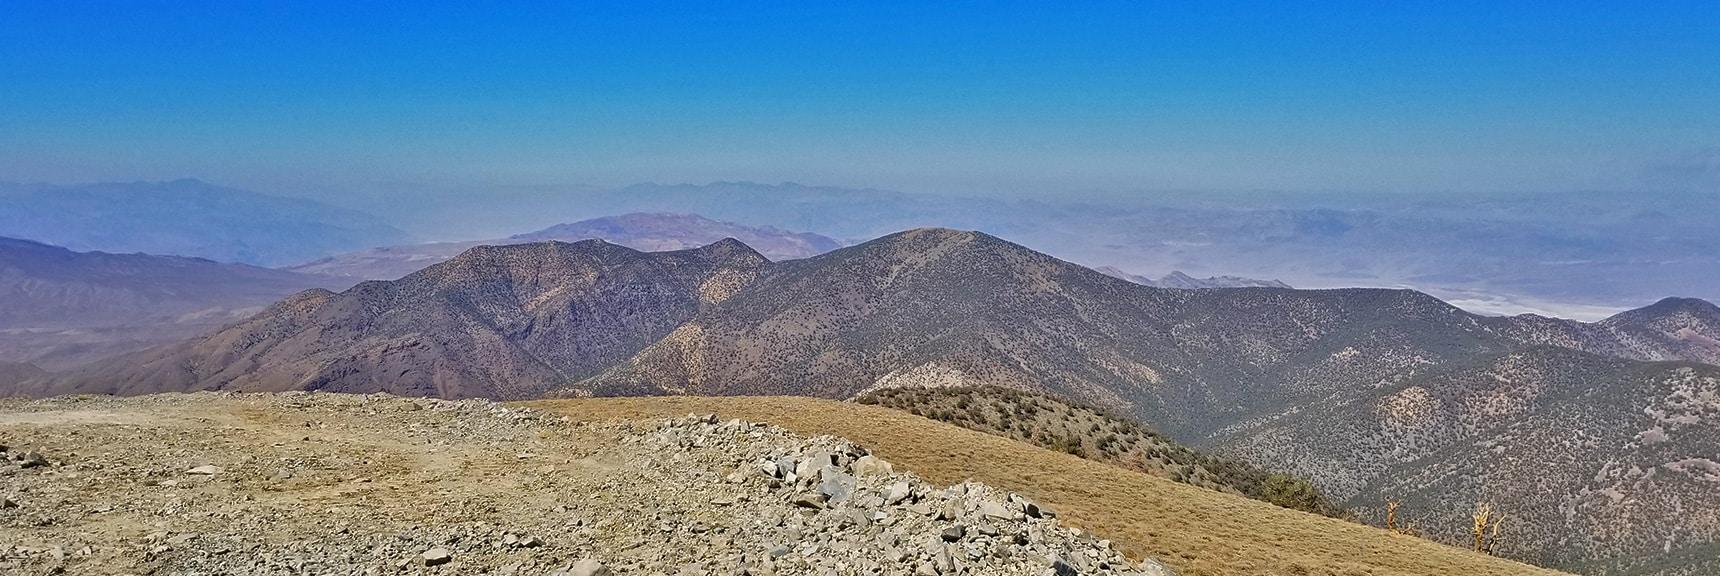 Wildrose Peak Viewed from Rogers Peak Summit   Telescope Peak Summit from Wildrose Charcoal Kilns Parking Area, Panamint Mountains, Death Valley National Park, California